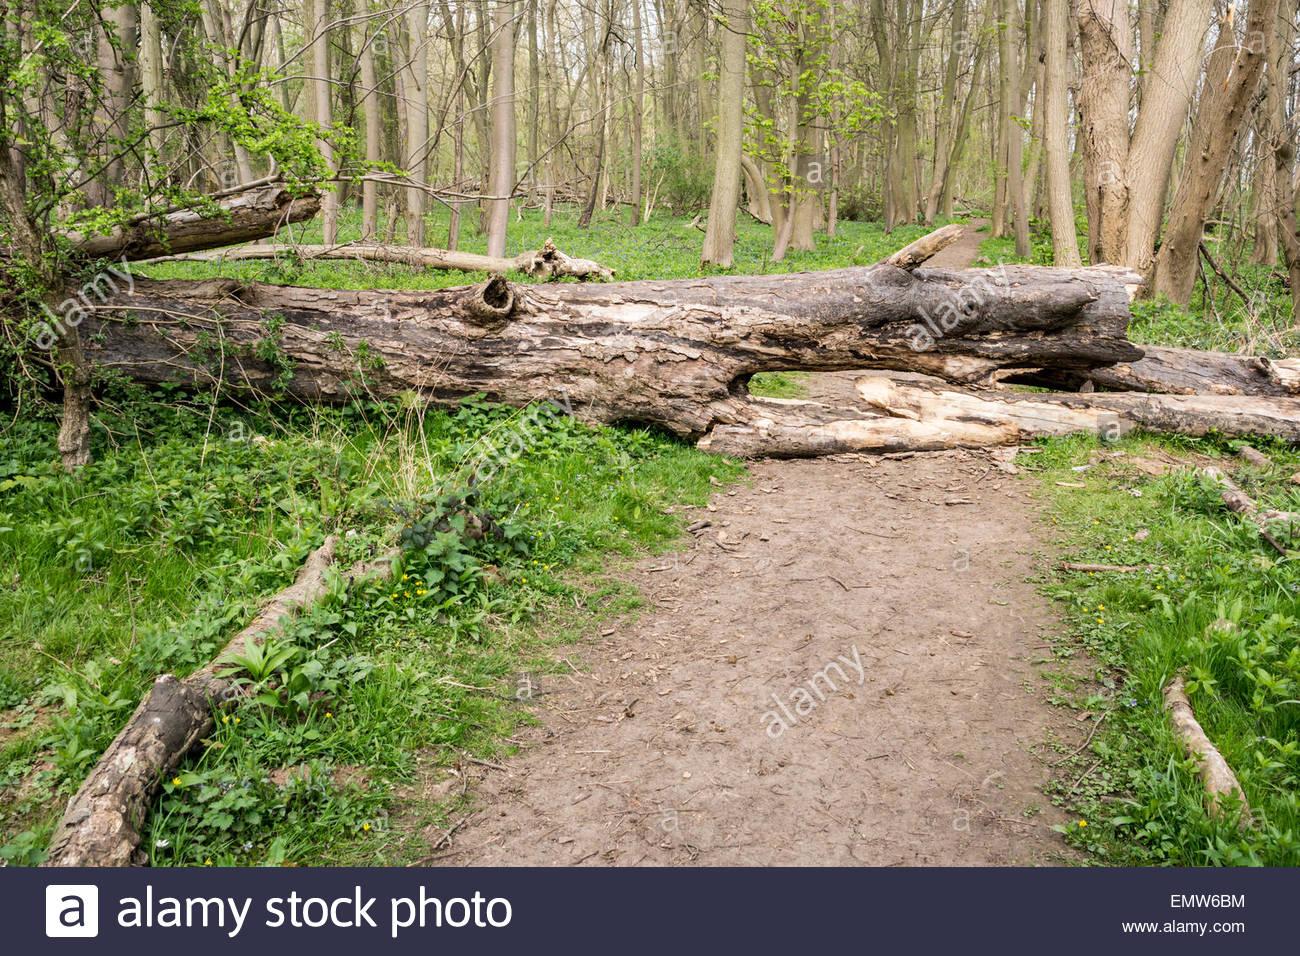 Fallen tree blocking a woodland path - Stock Image